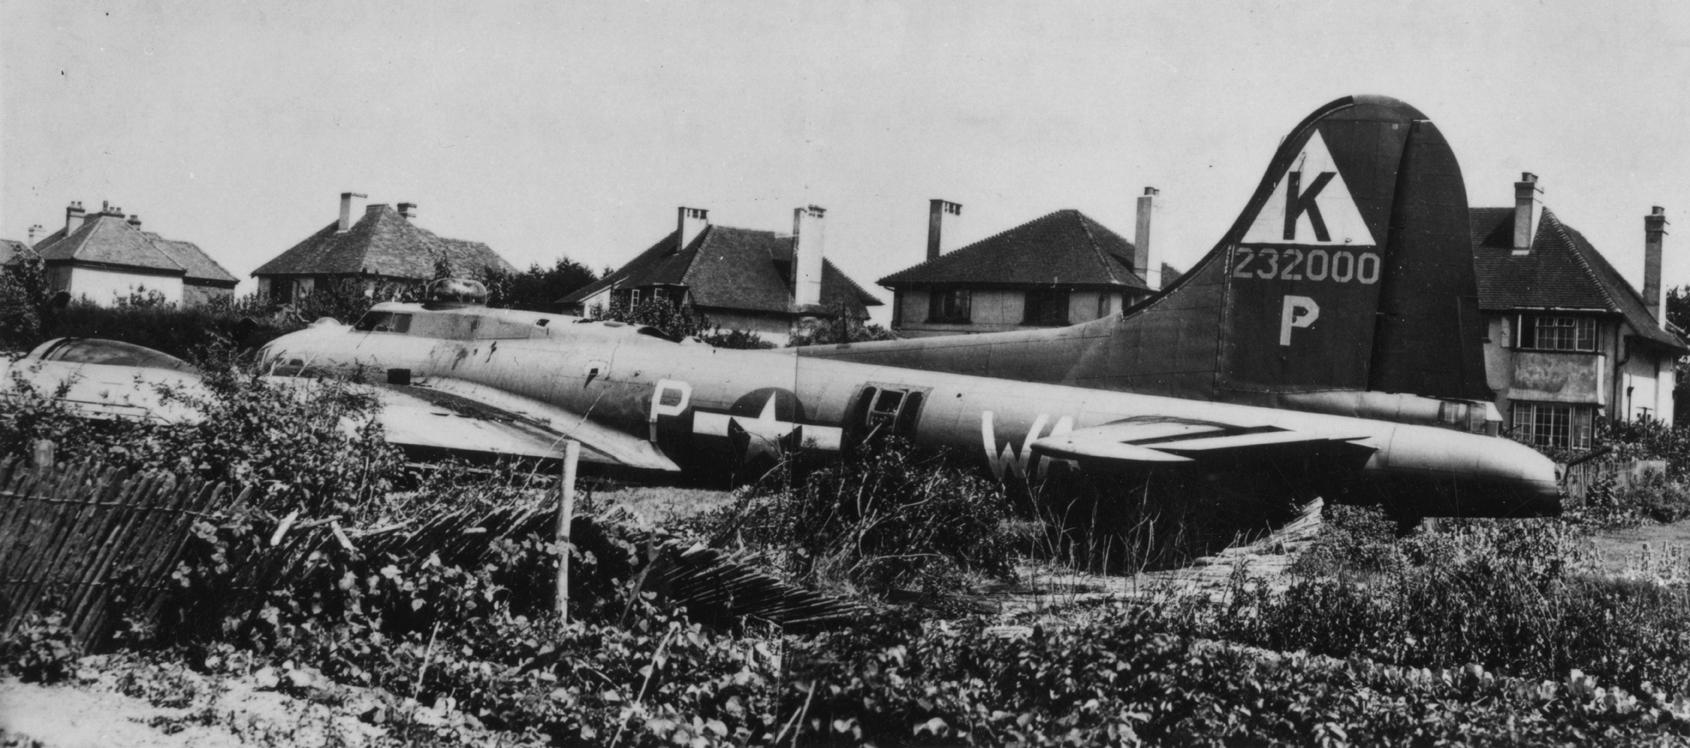 B-17 #42-32000 / Mojo Jr aka Twentieth Century